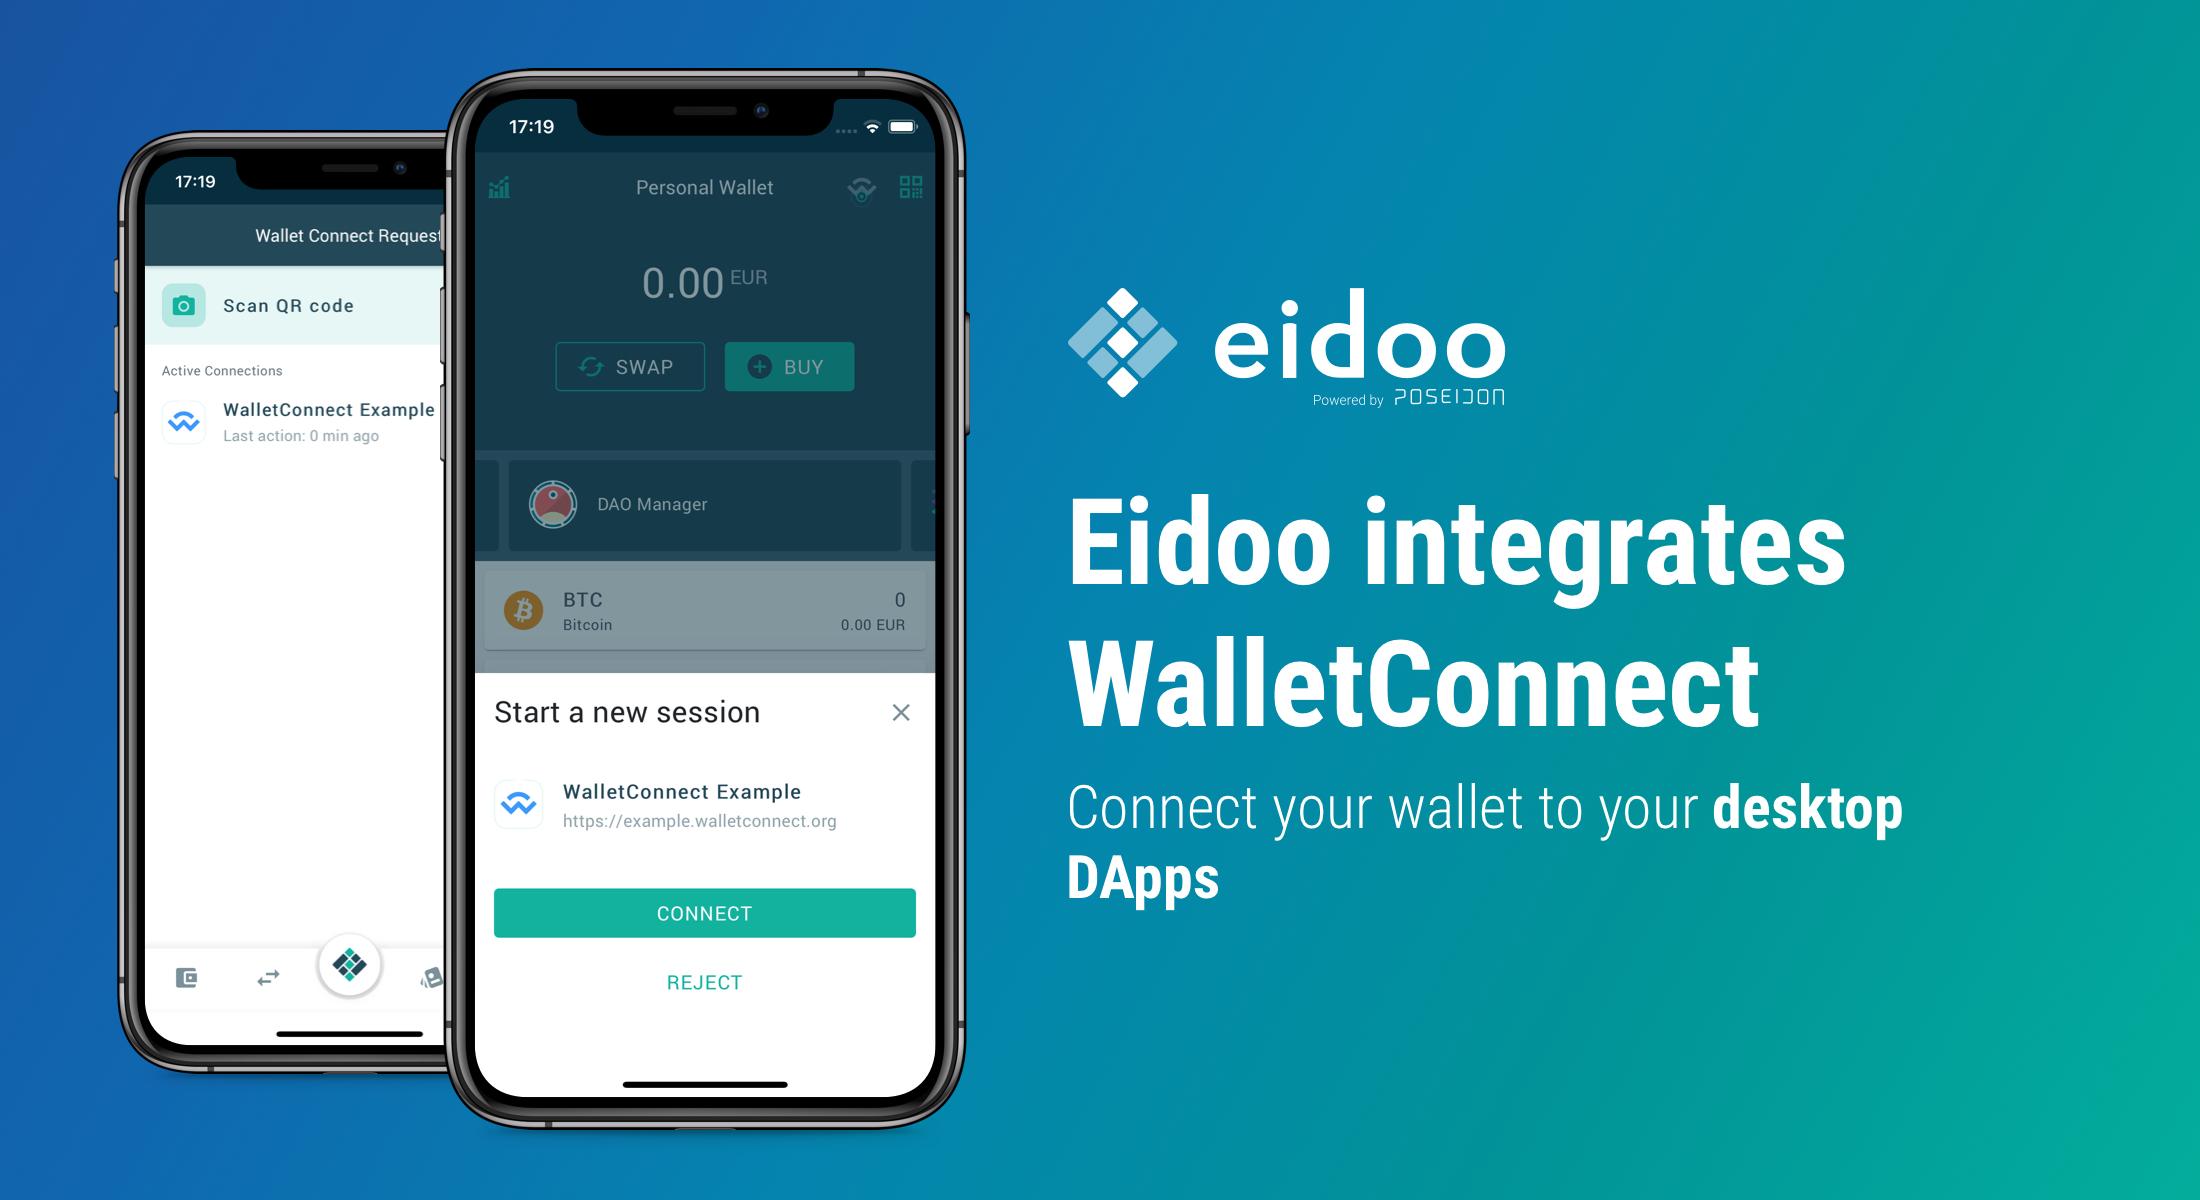 Eidoo integrates WalletConnect